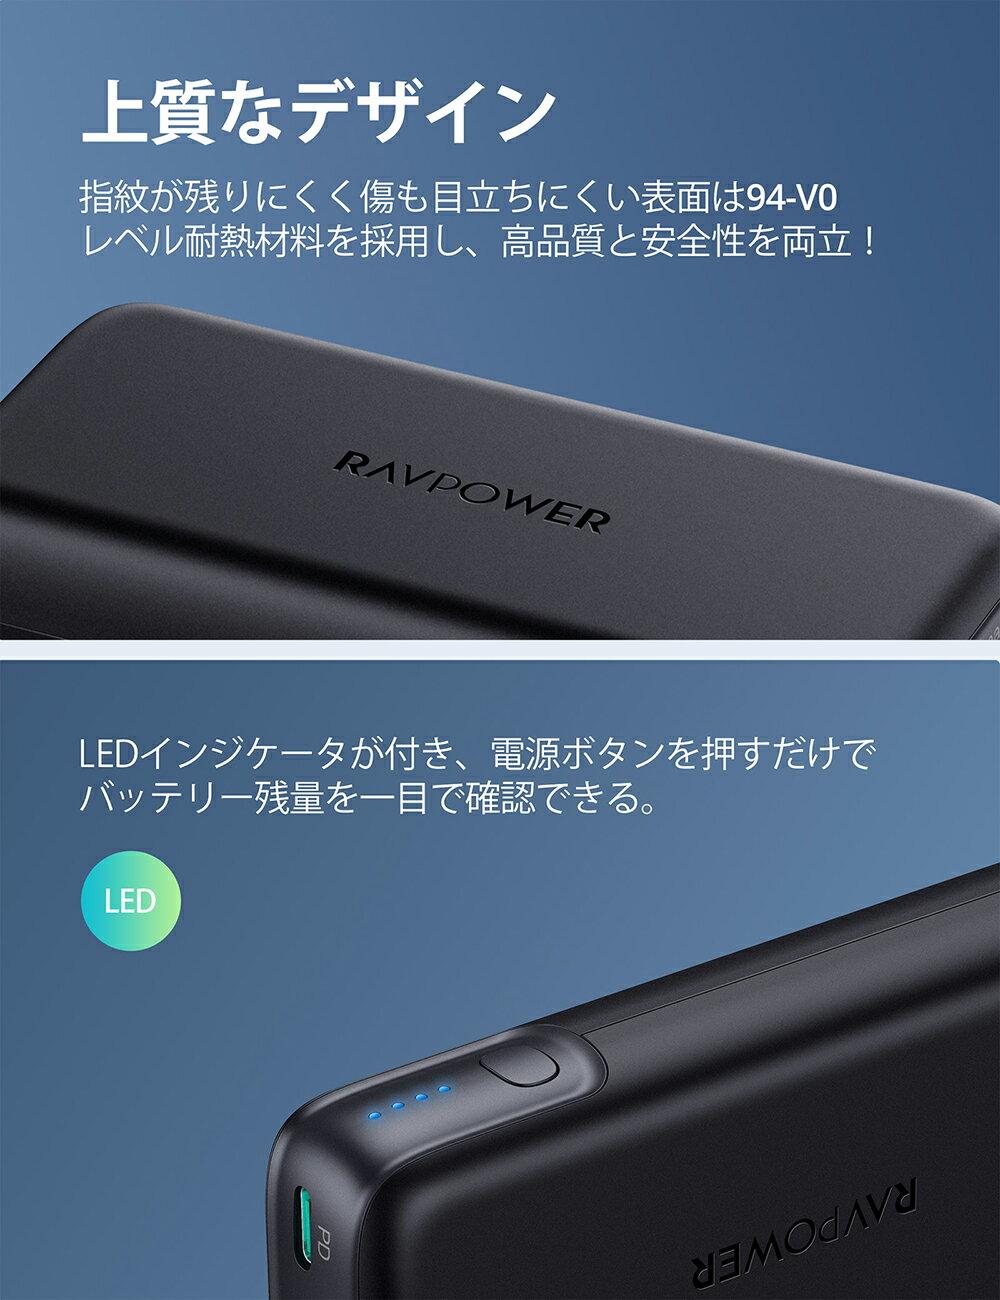 RAVPowerモバイルバッテリー10000mAhPD対応最大18W出力USB-Aポート(世界最小最軽量クラス)【USB-C入出力ポート/PowerDelivery対応/PSE認証済】iPhoneiPadAndroid等対応送料無料